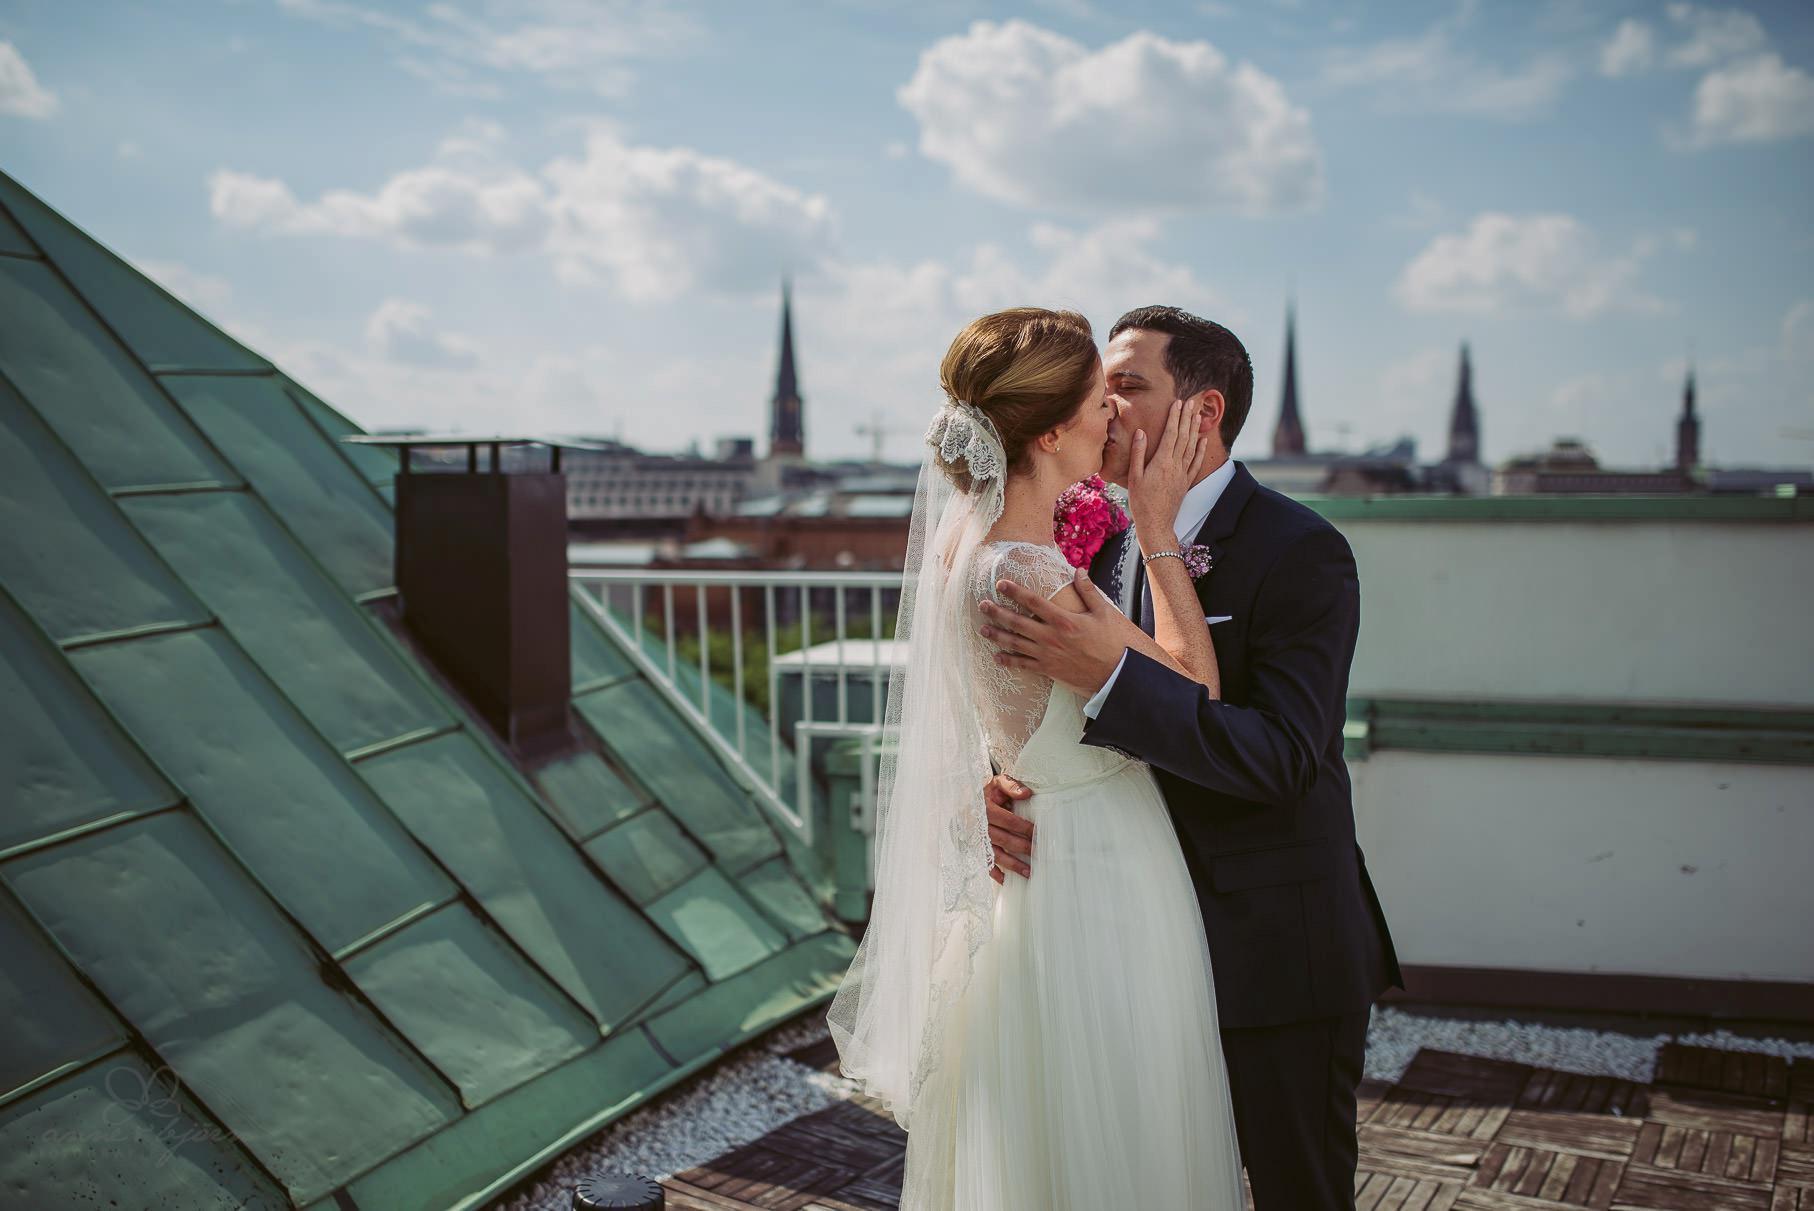 0025 aud blog 811 9935 - Hochzeit an der Hamburger Elbe - Ann-Katrin & Daniel